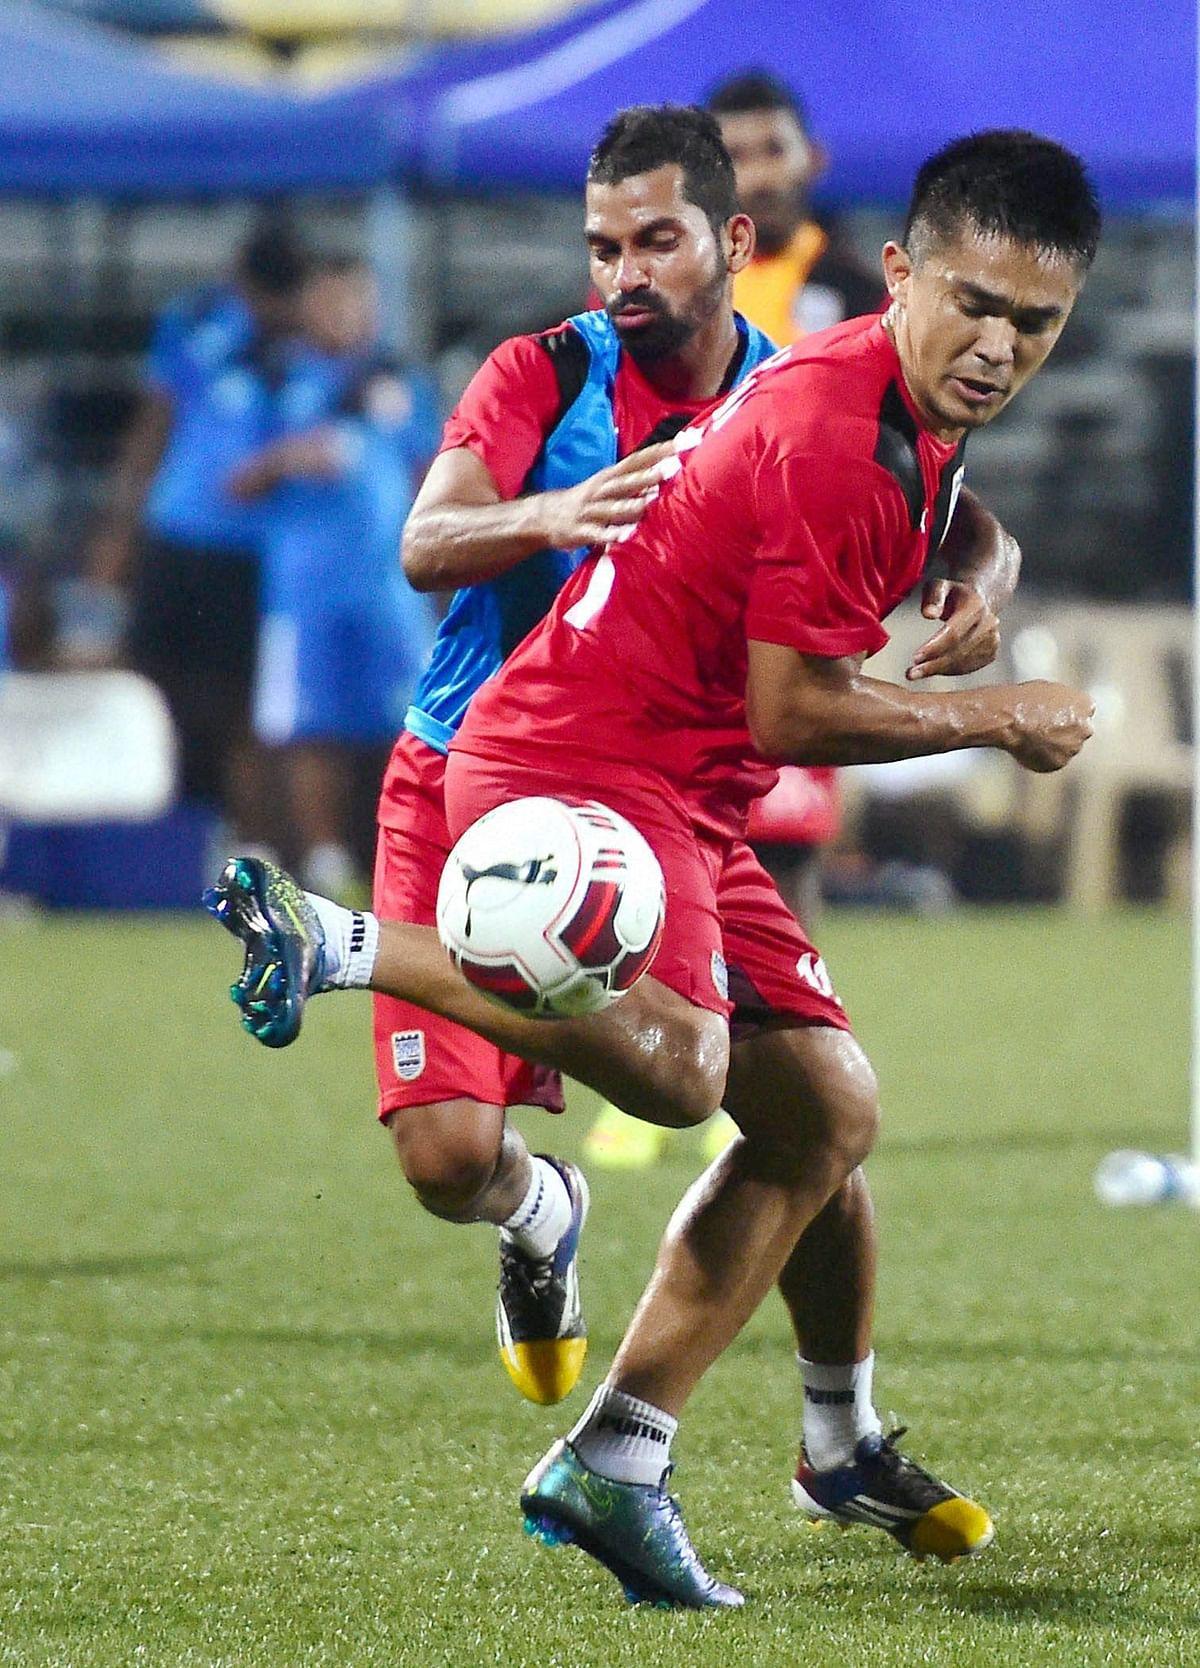 Sunil Chhetri during a training session. (Photo: PTI)